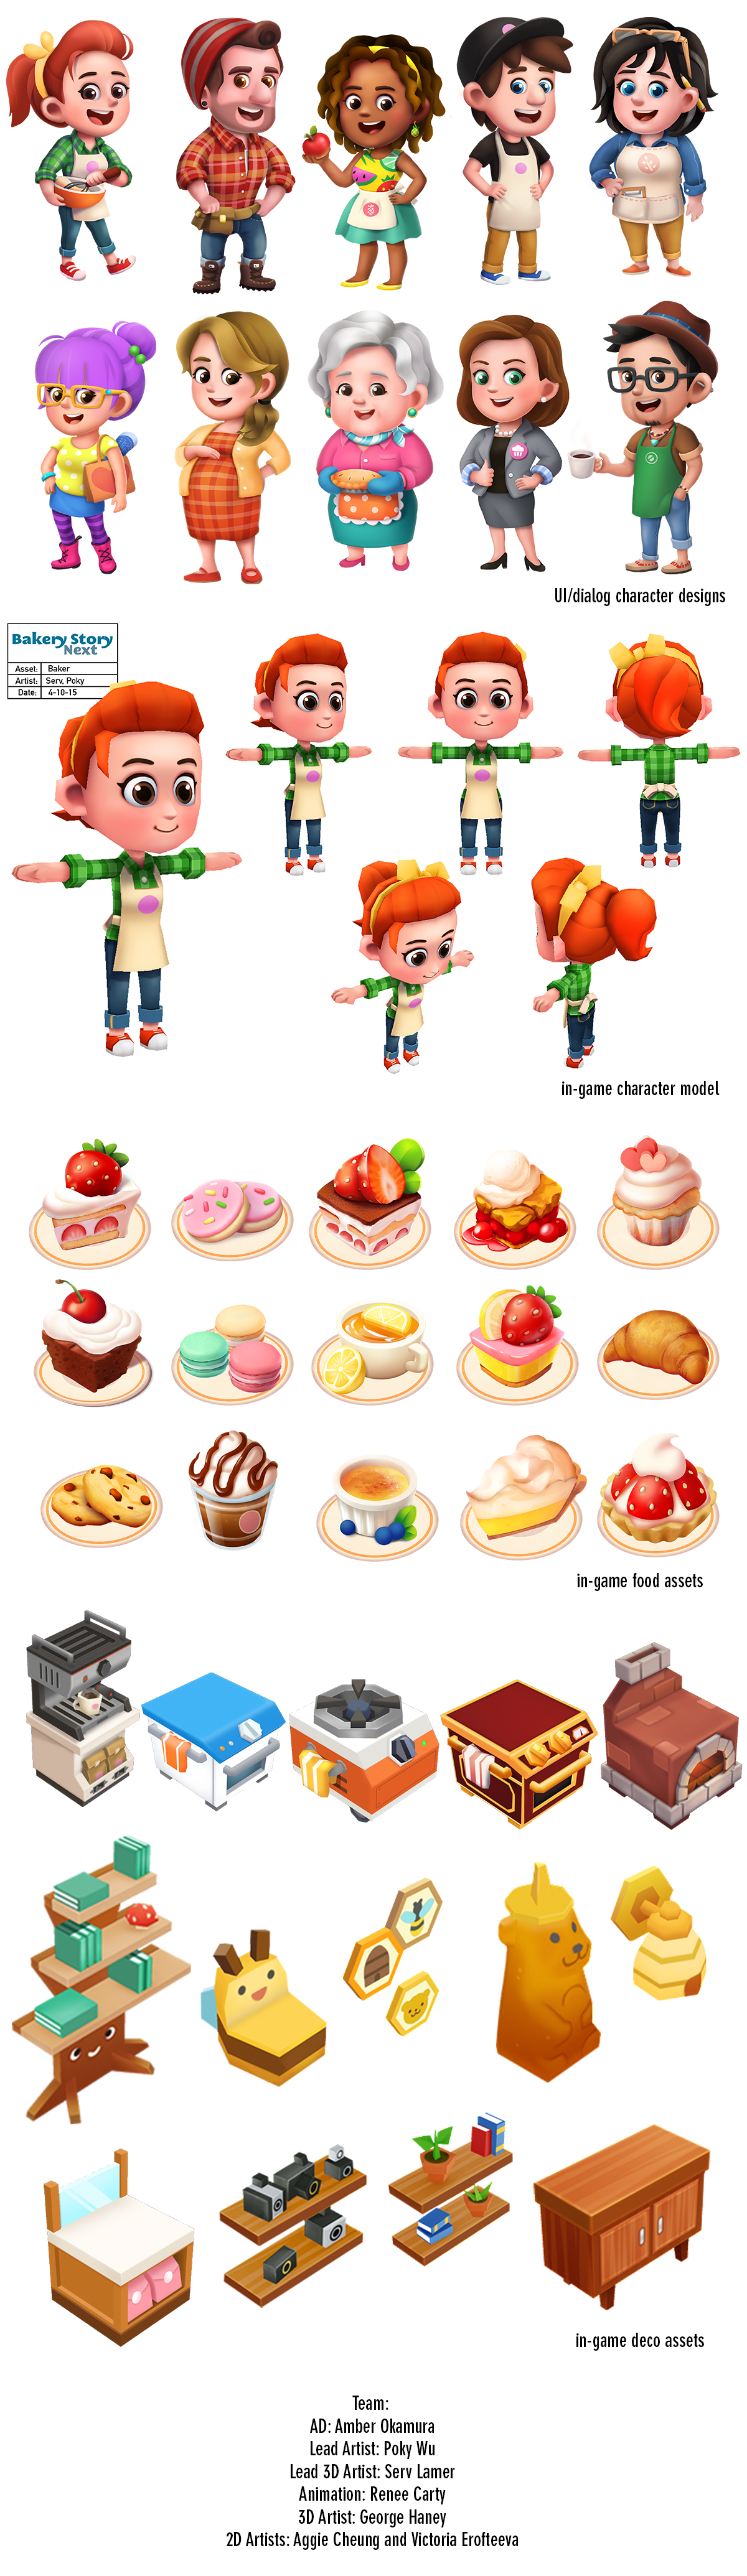 bakerystory2_2.png